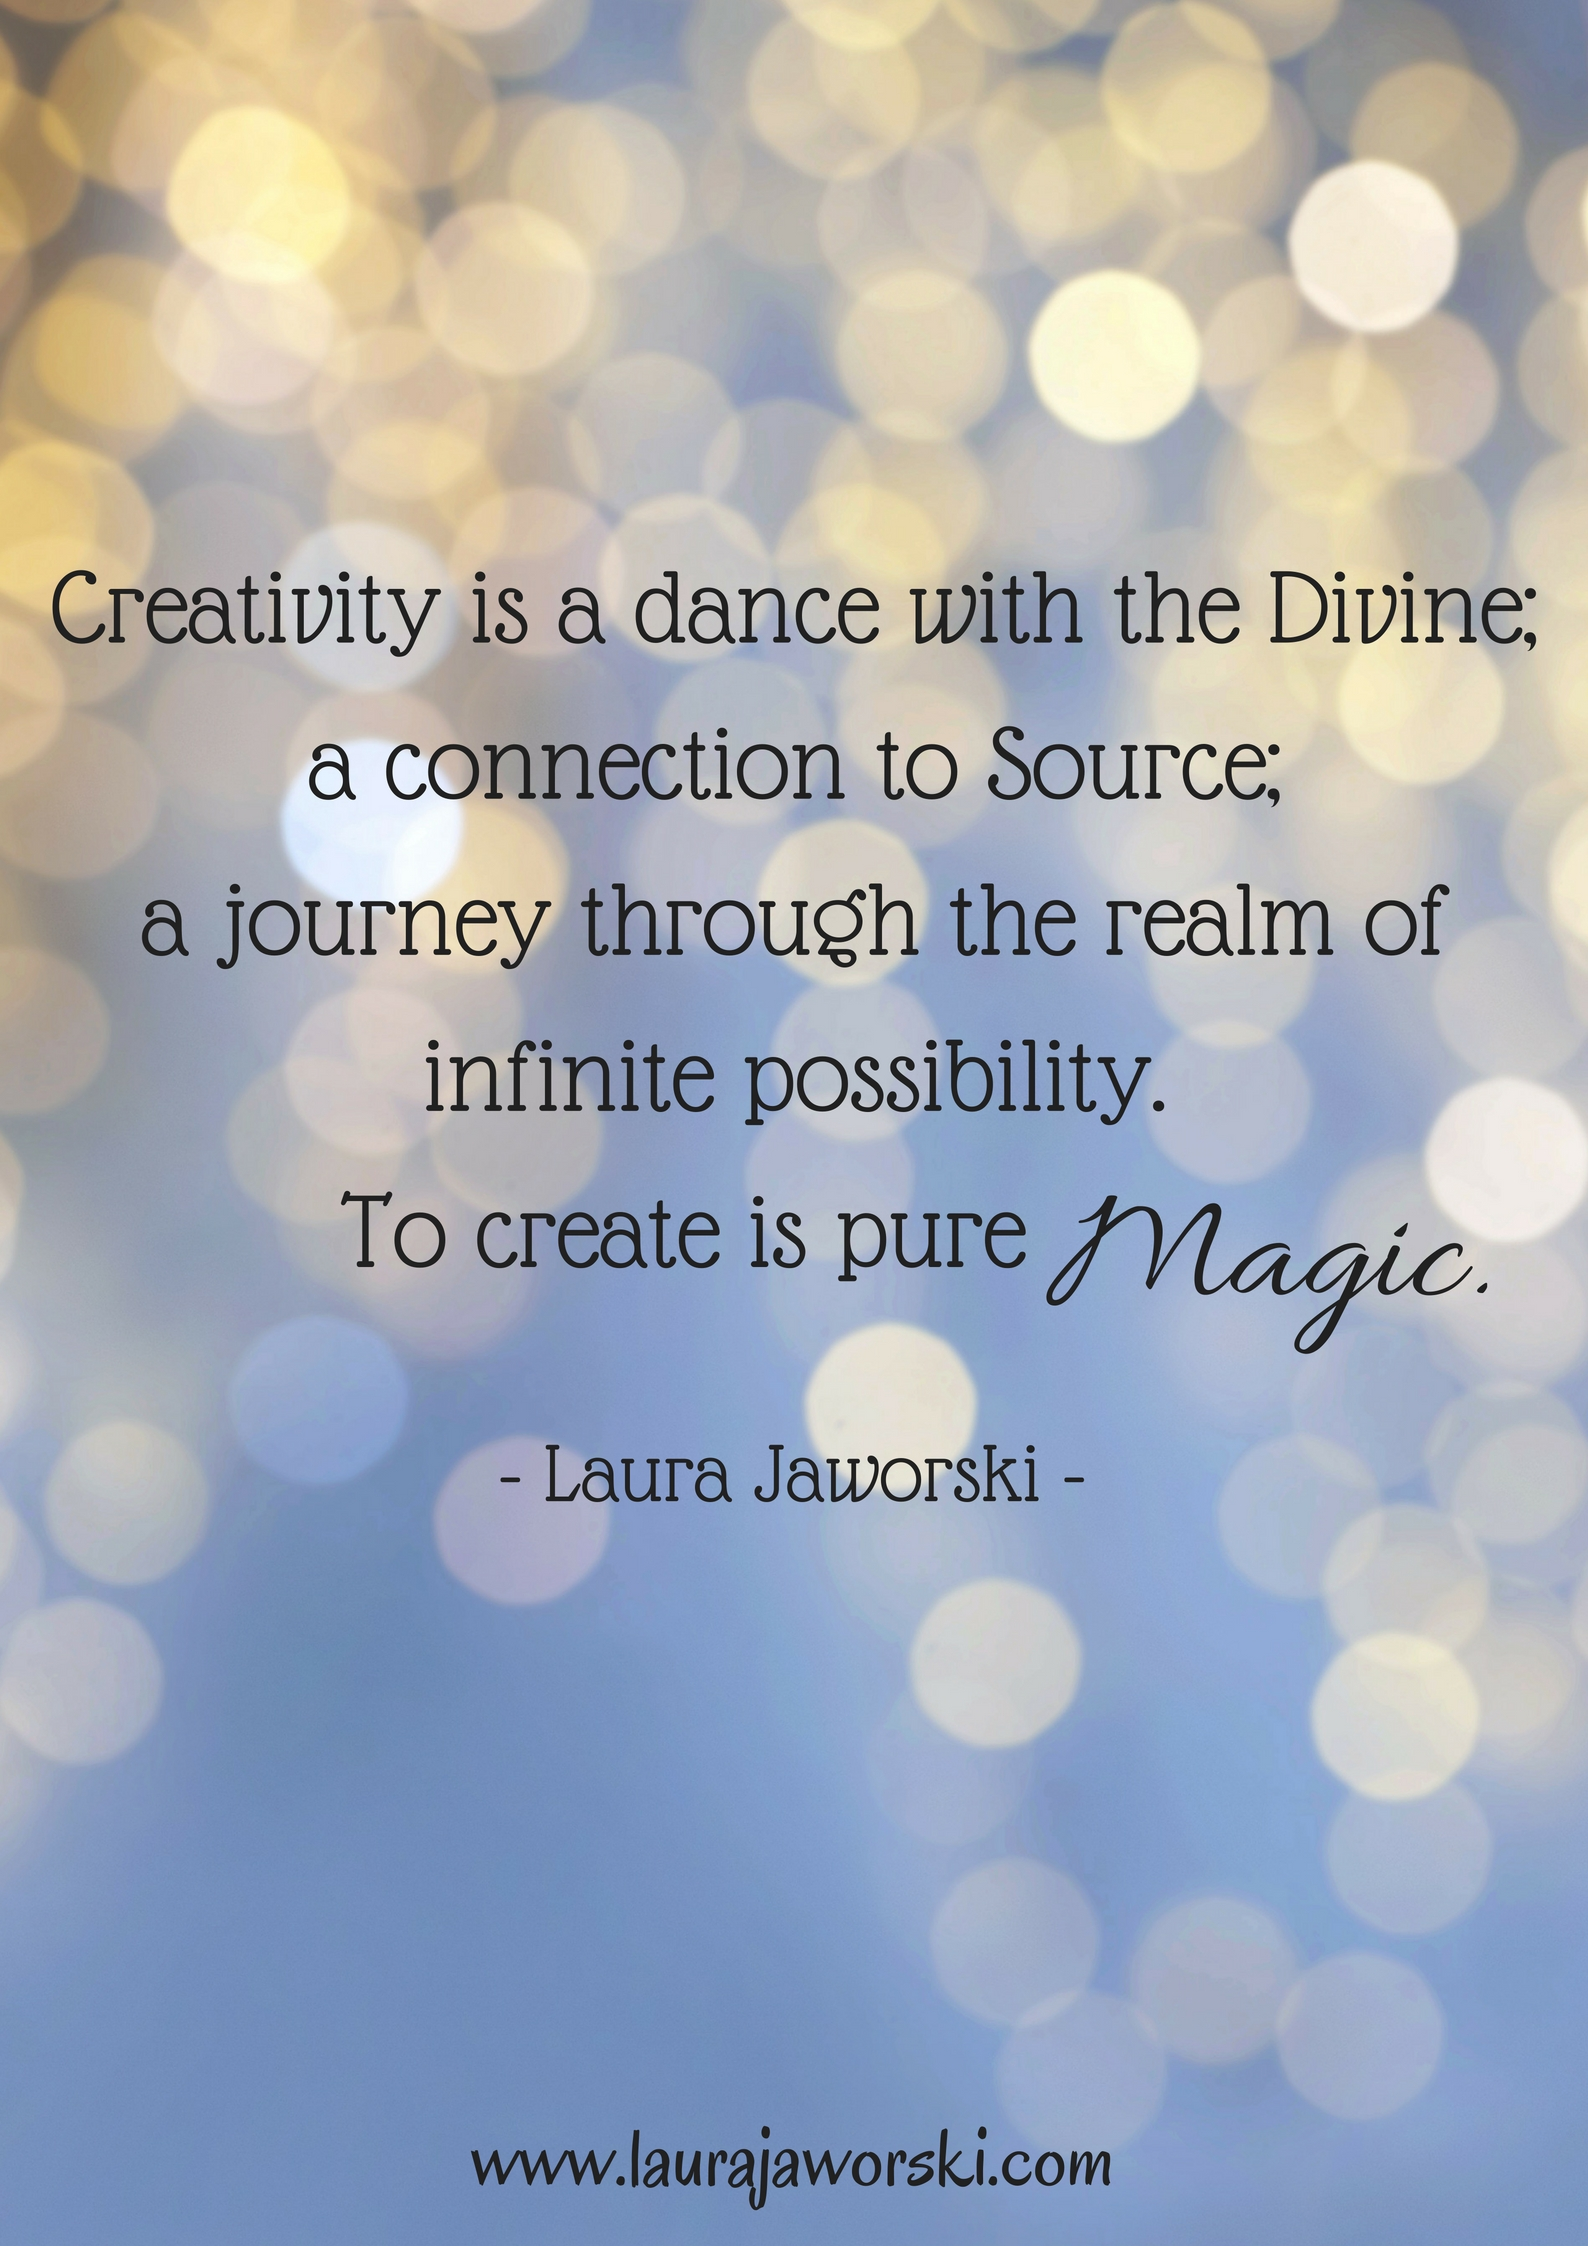 Creativity ♥ | www.laurajaworski.com